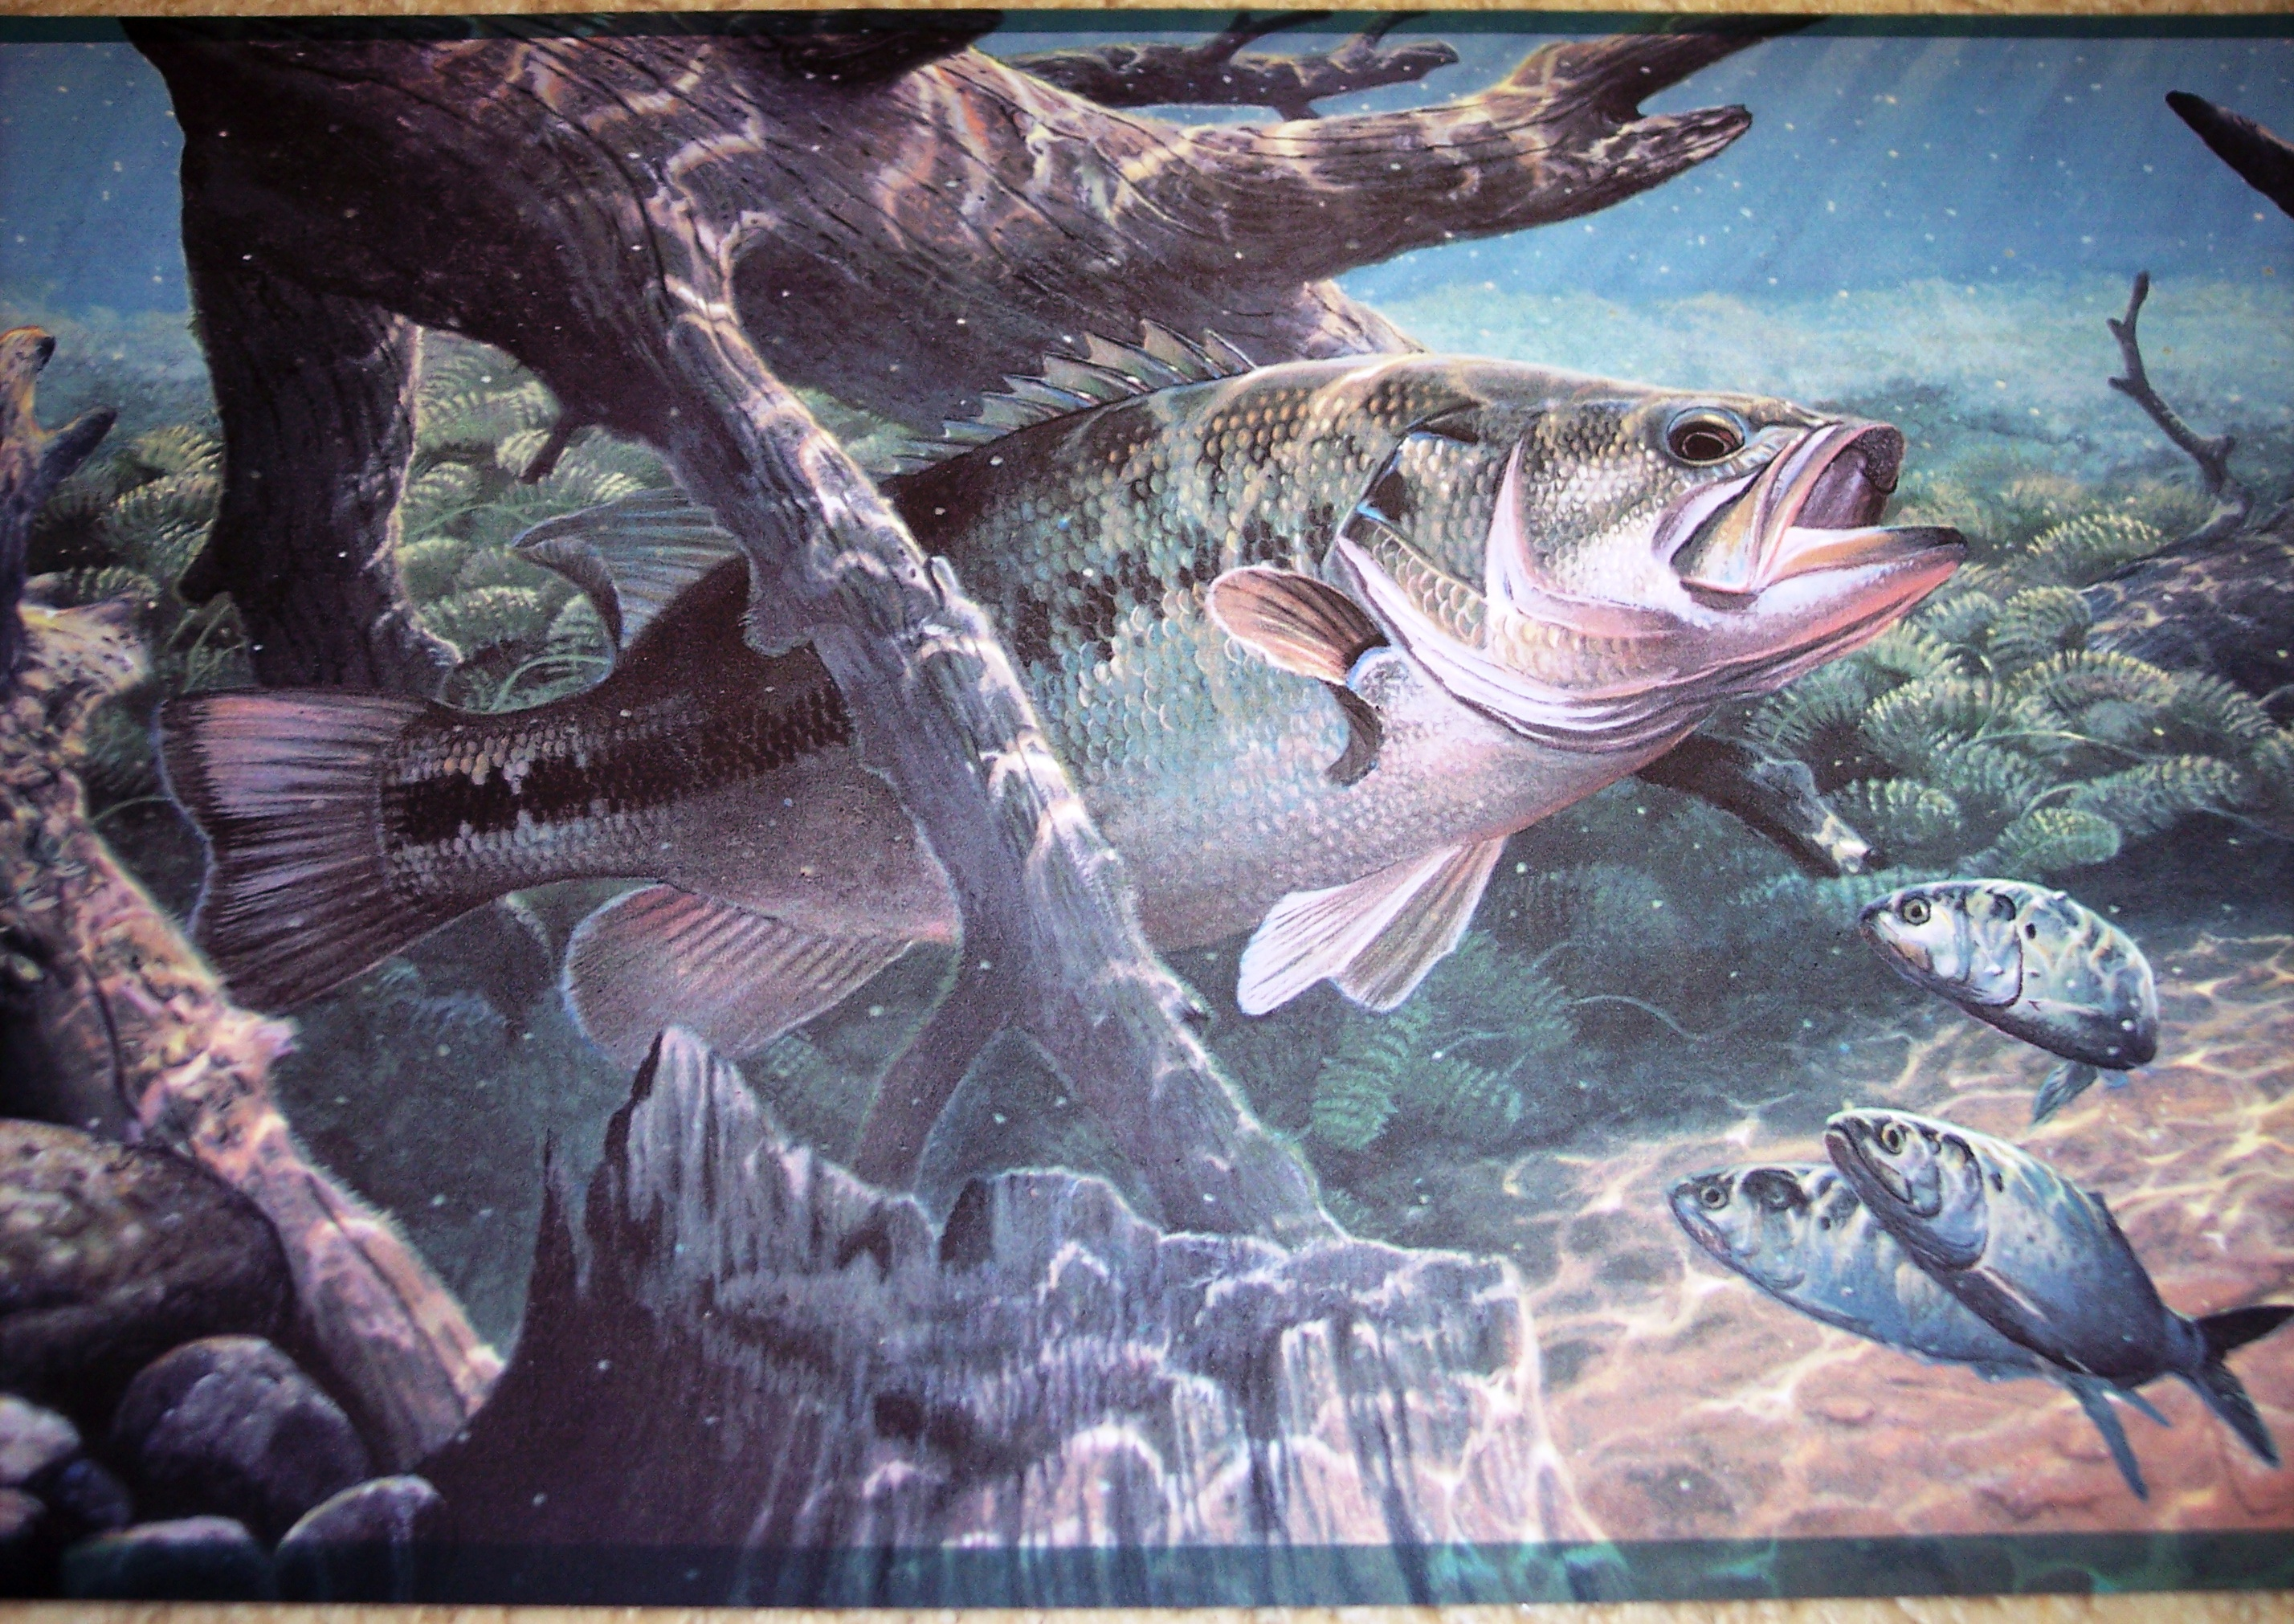 Bass Fish Wallpaper Wallpapers Gallery 2856x2022